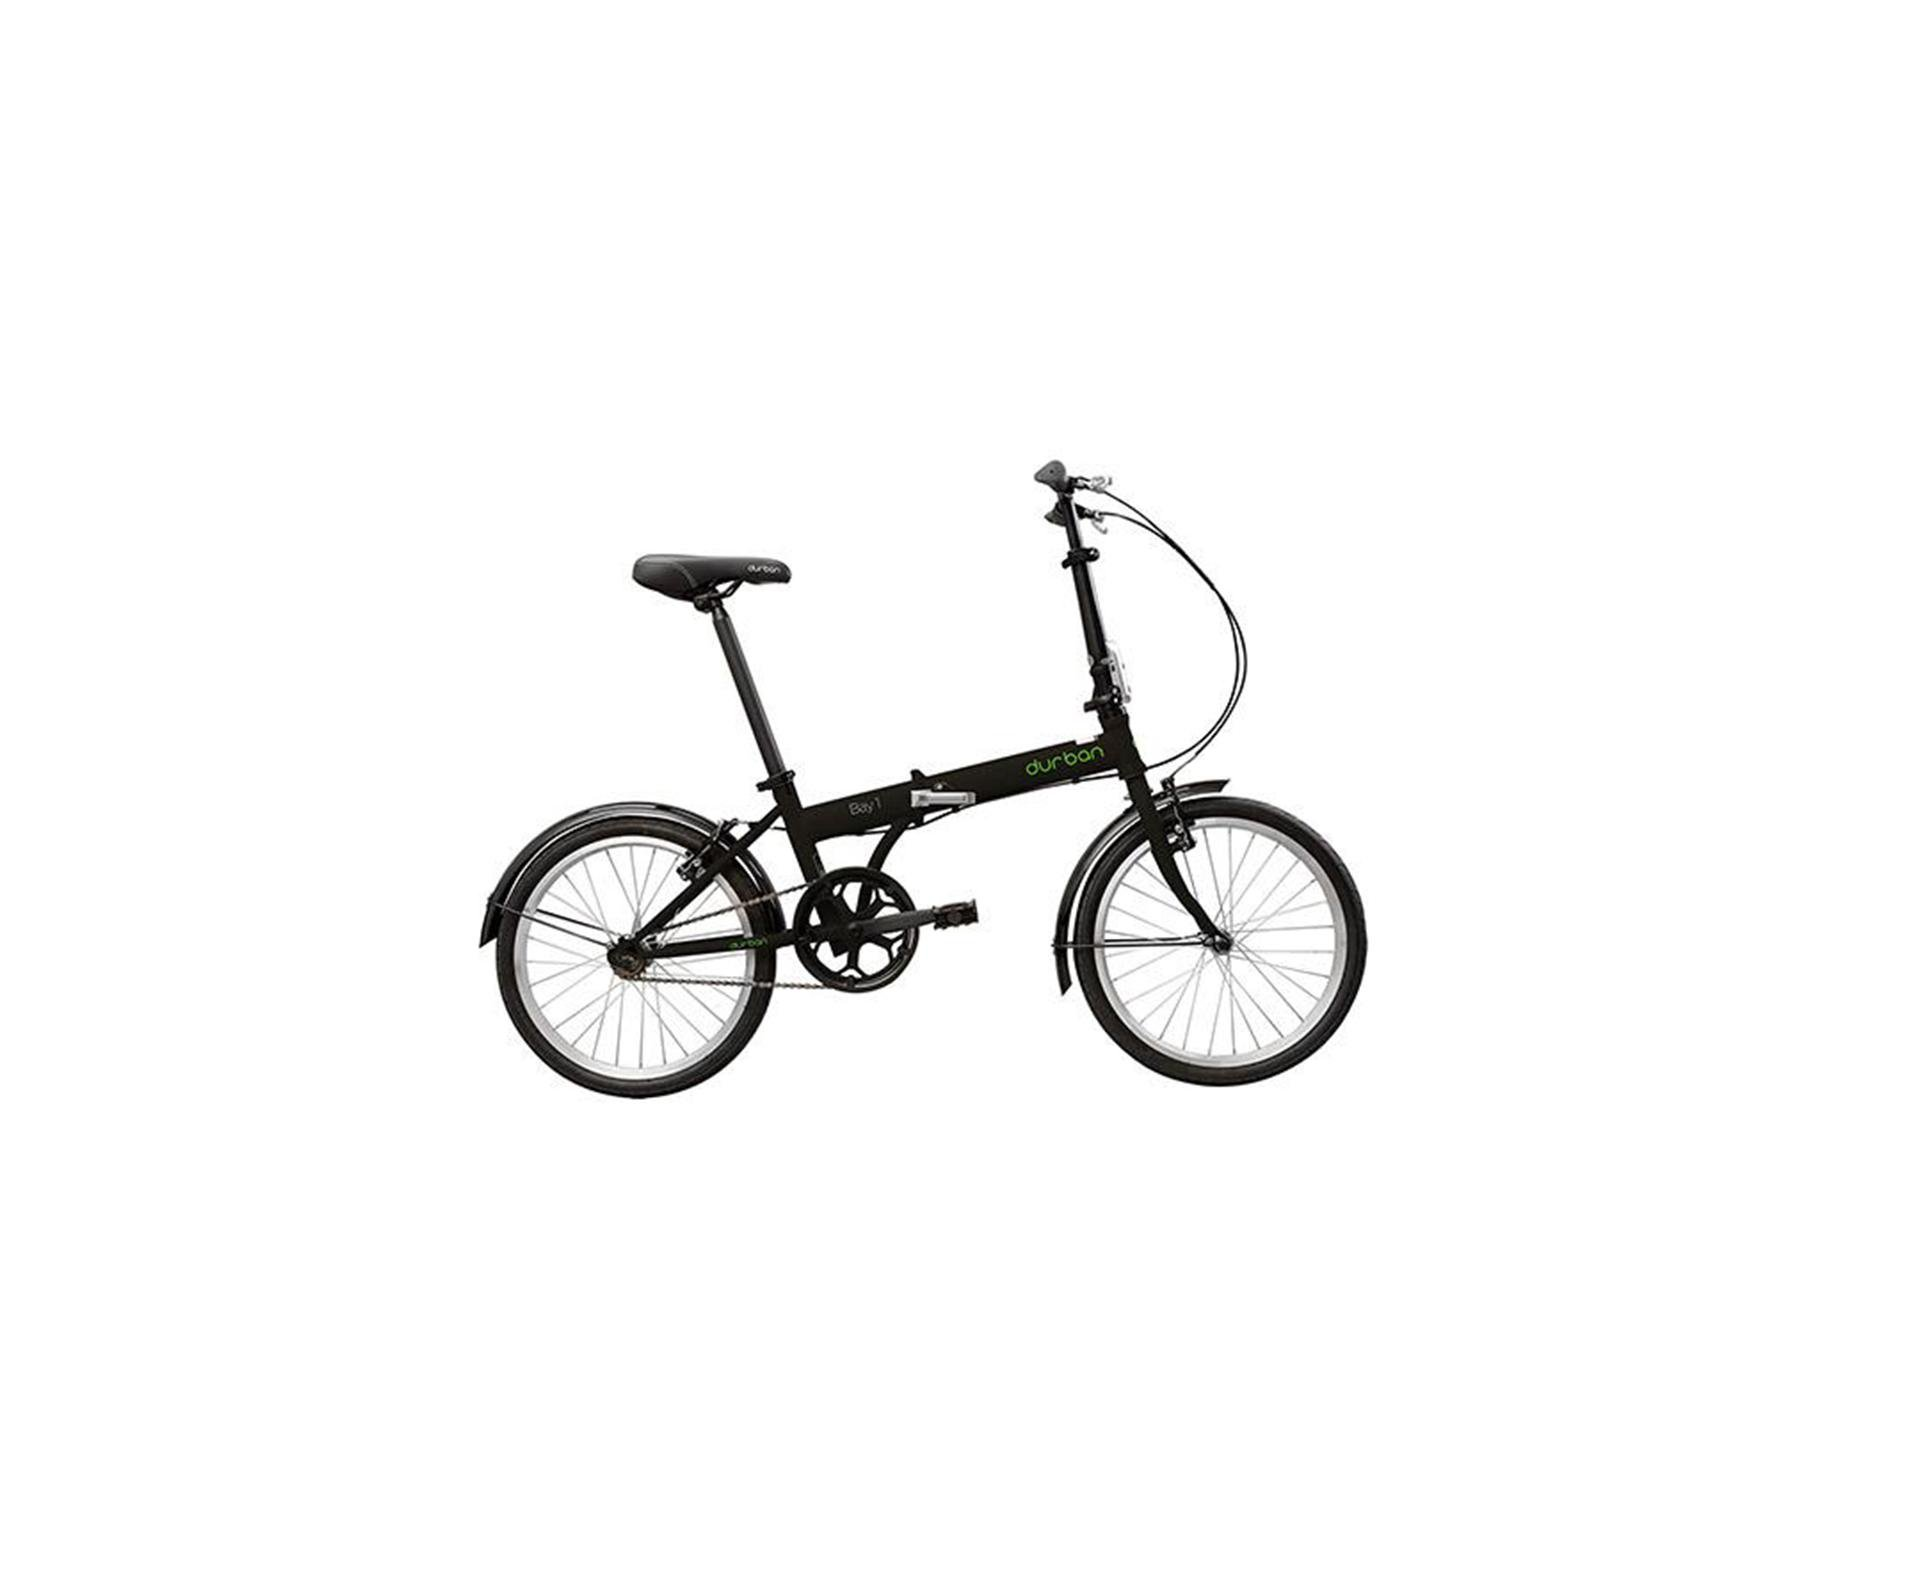 Bicicleta Durban Dobrável Bay 1 Preta - Nautika